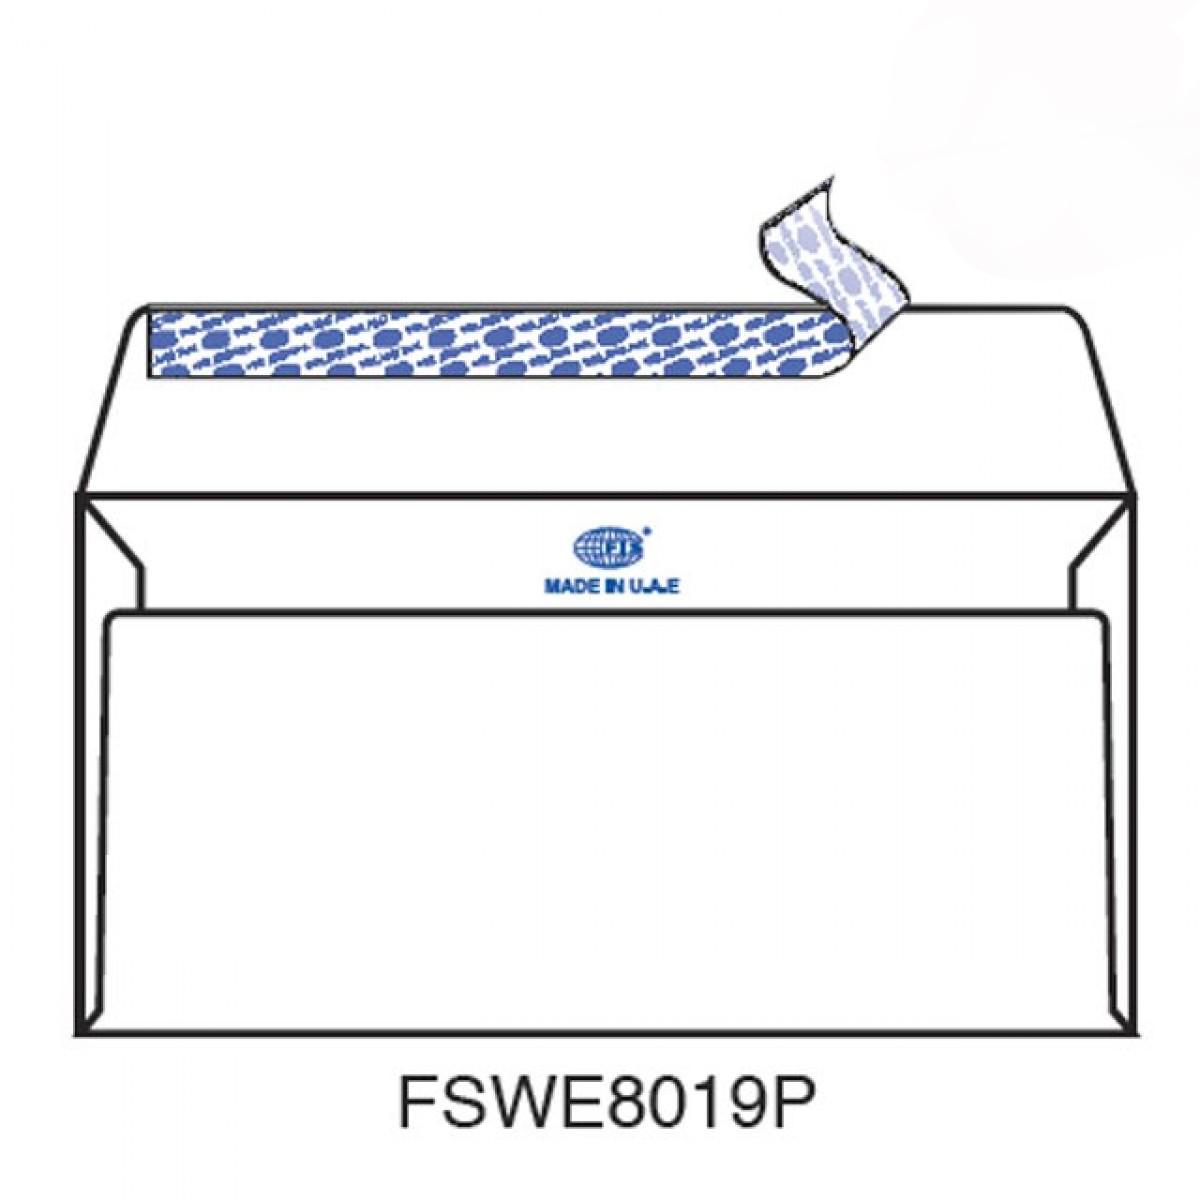 FIS Peel & Seal Envelope 80gsm 115mm x 225mm FSWE8019P - White (box/500pcs)